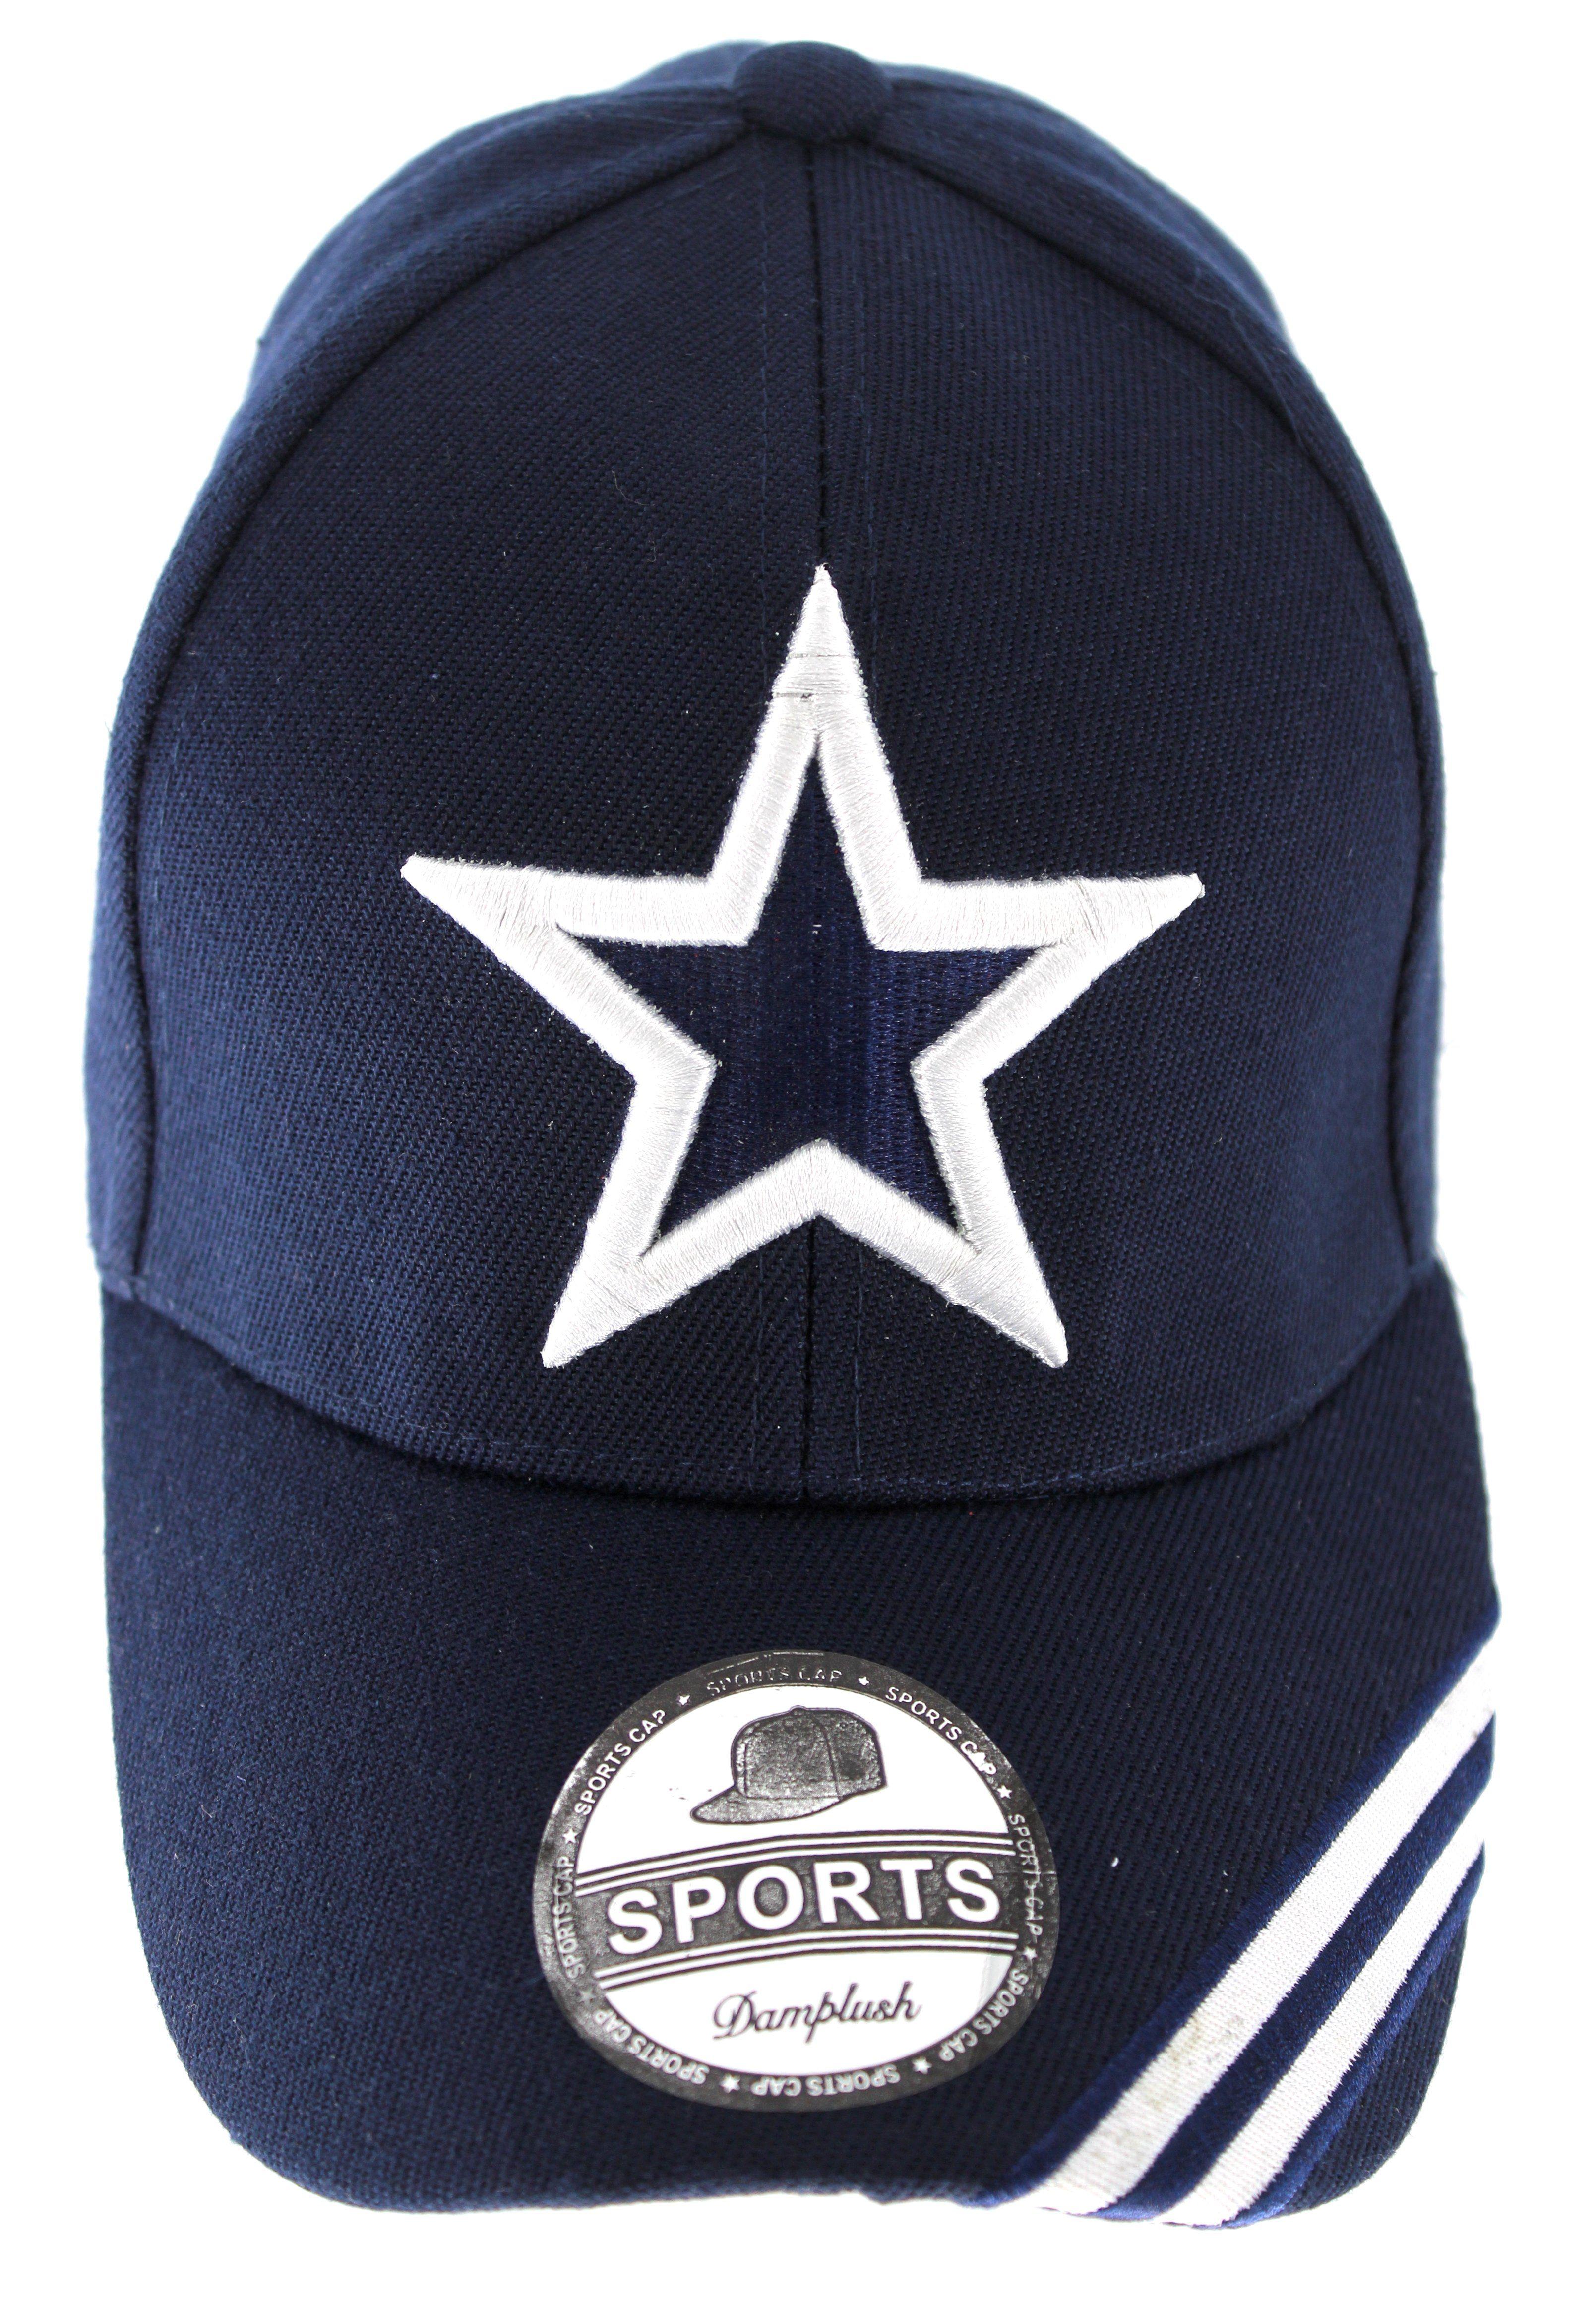 UNISEX DALLAS TEXAS CITY WHITE STAR NAVY COLOR ADJUSTABLE BASEBALL CAP HAT 6fa4cc633